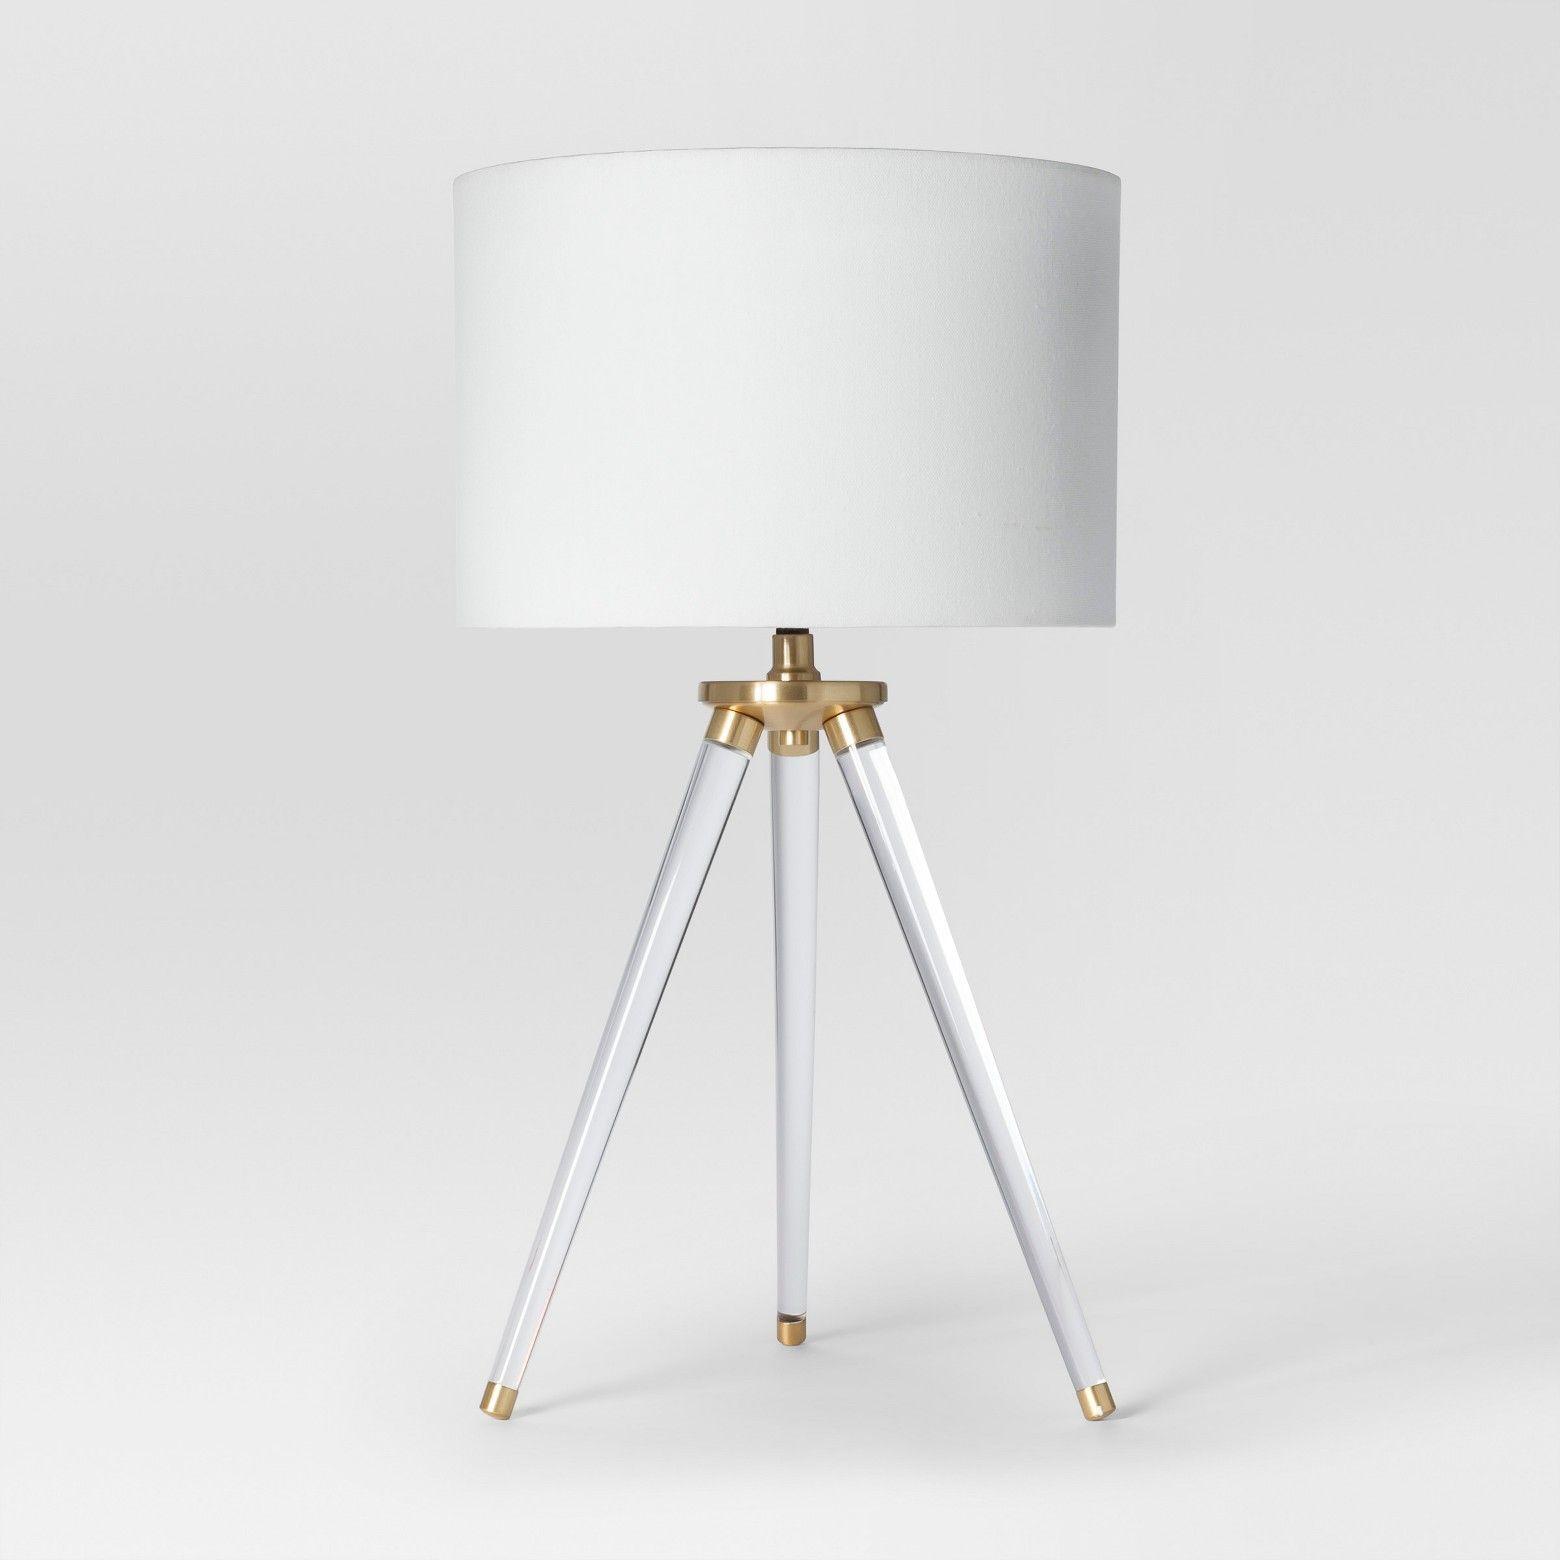 Delavan Tripod Table Lamp Project 62 Lamp Tripod Table Lamp